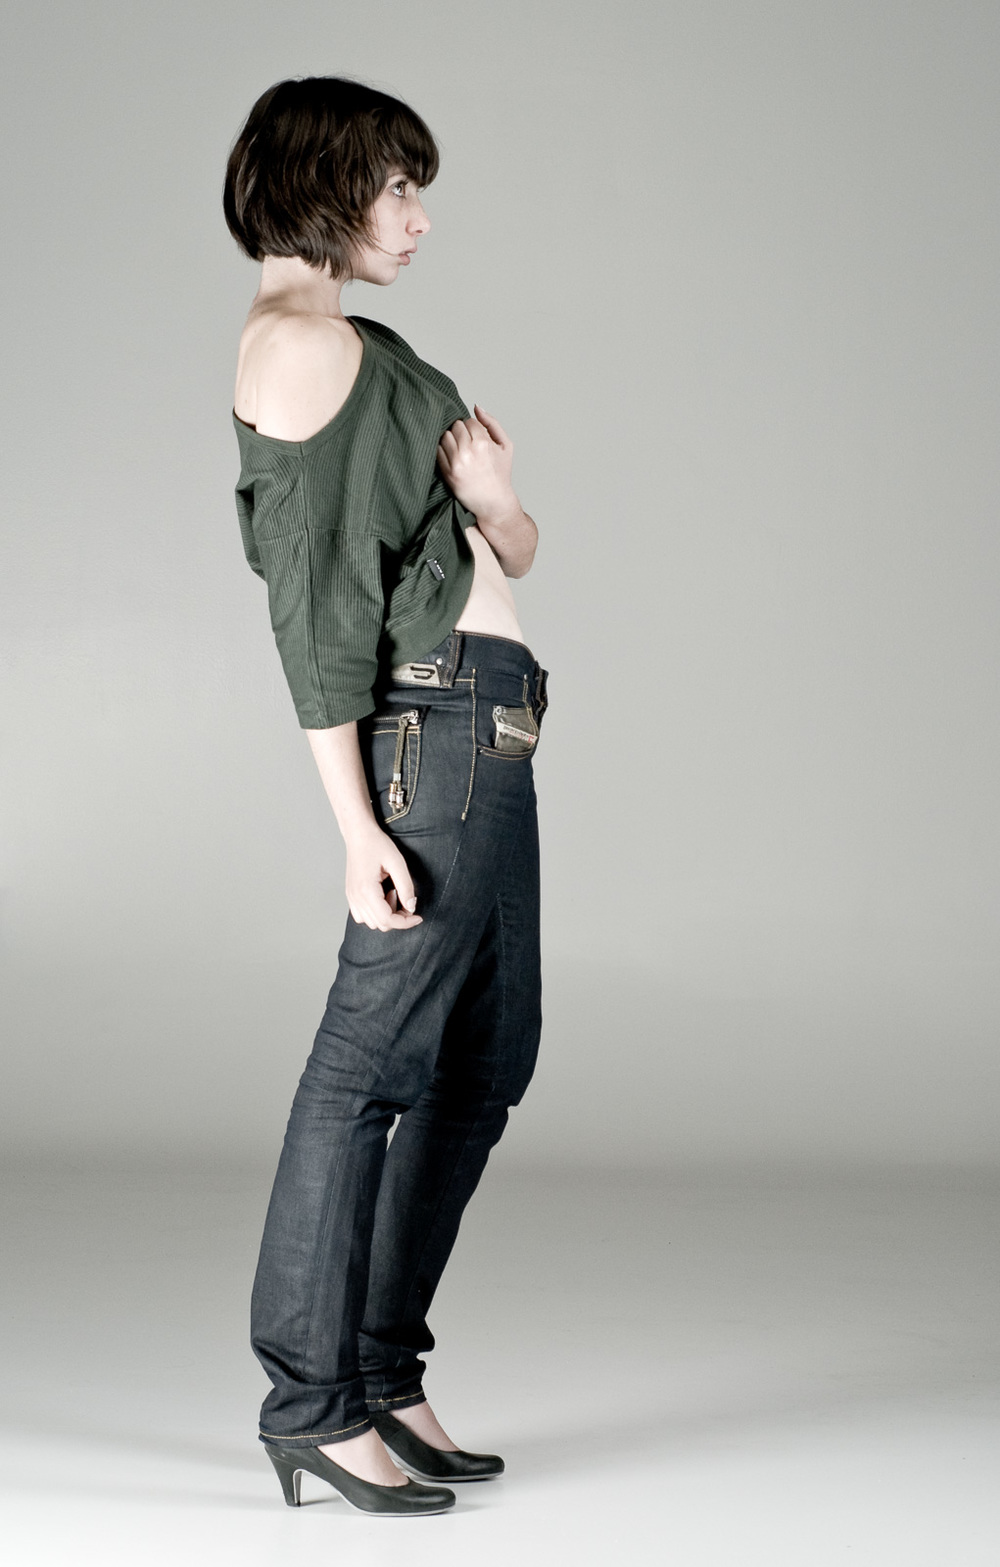 Bernard_Panier-FashionLike-003.jpg